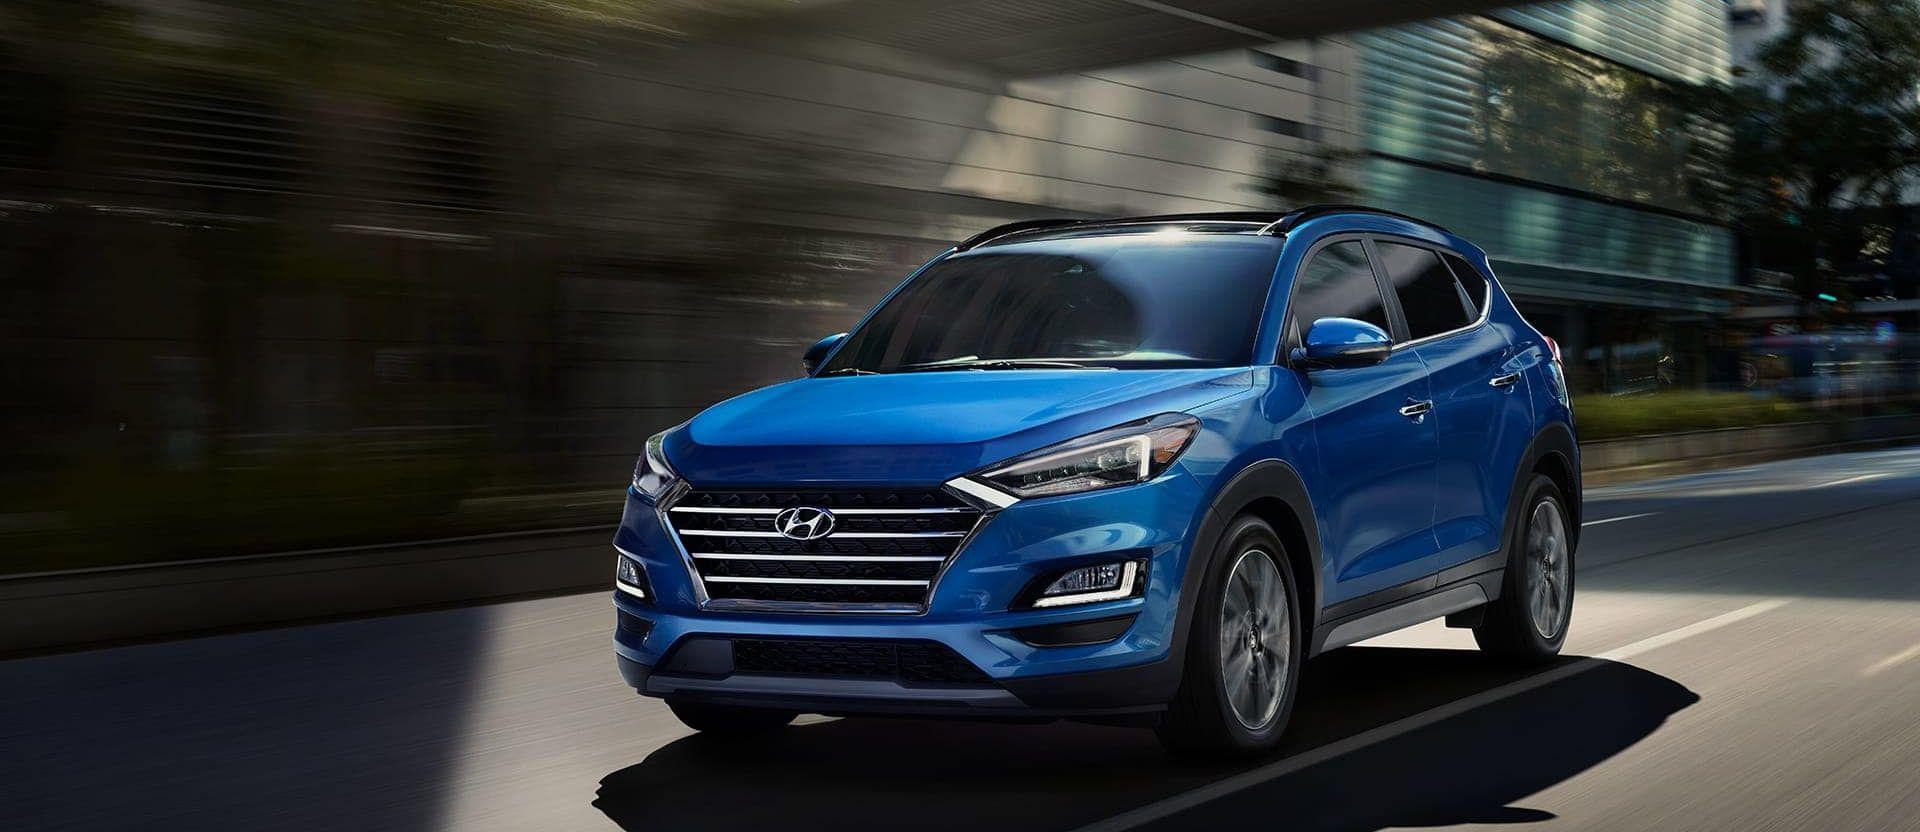 2019 Hyundai Tucson Leasing near Manassas, VA